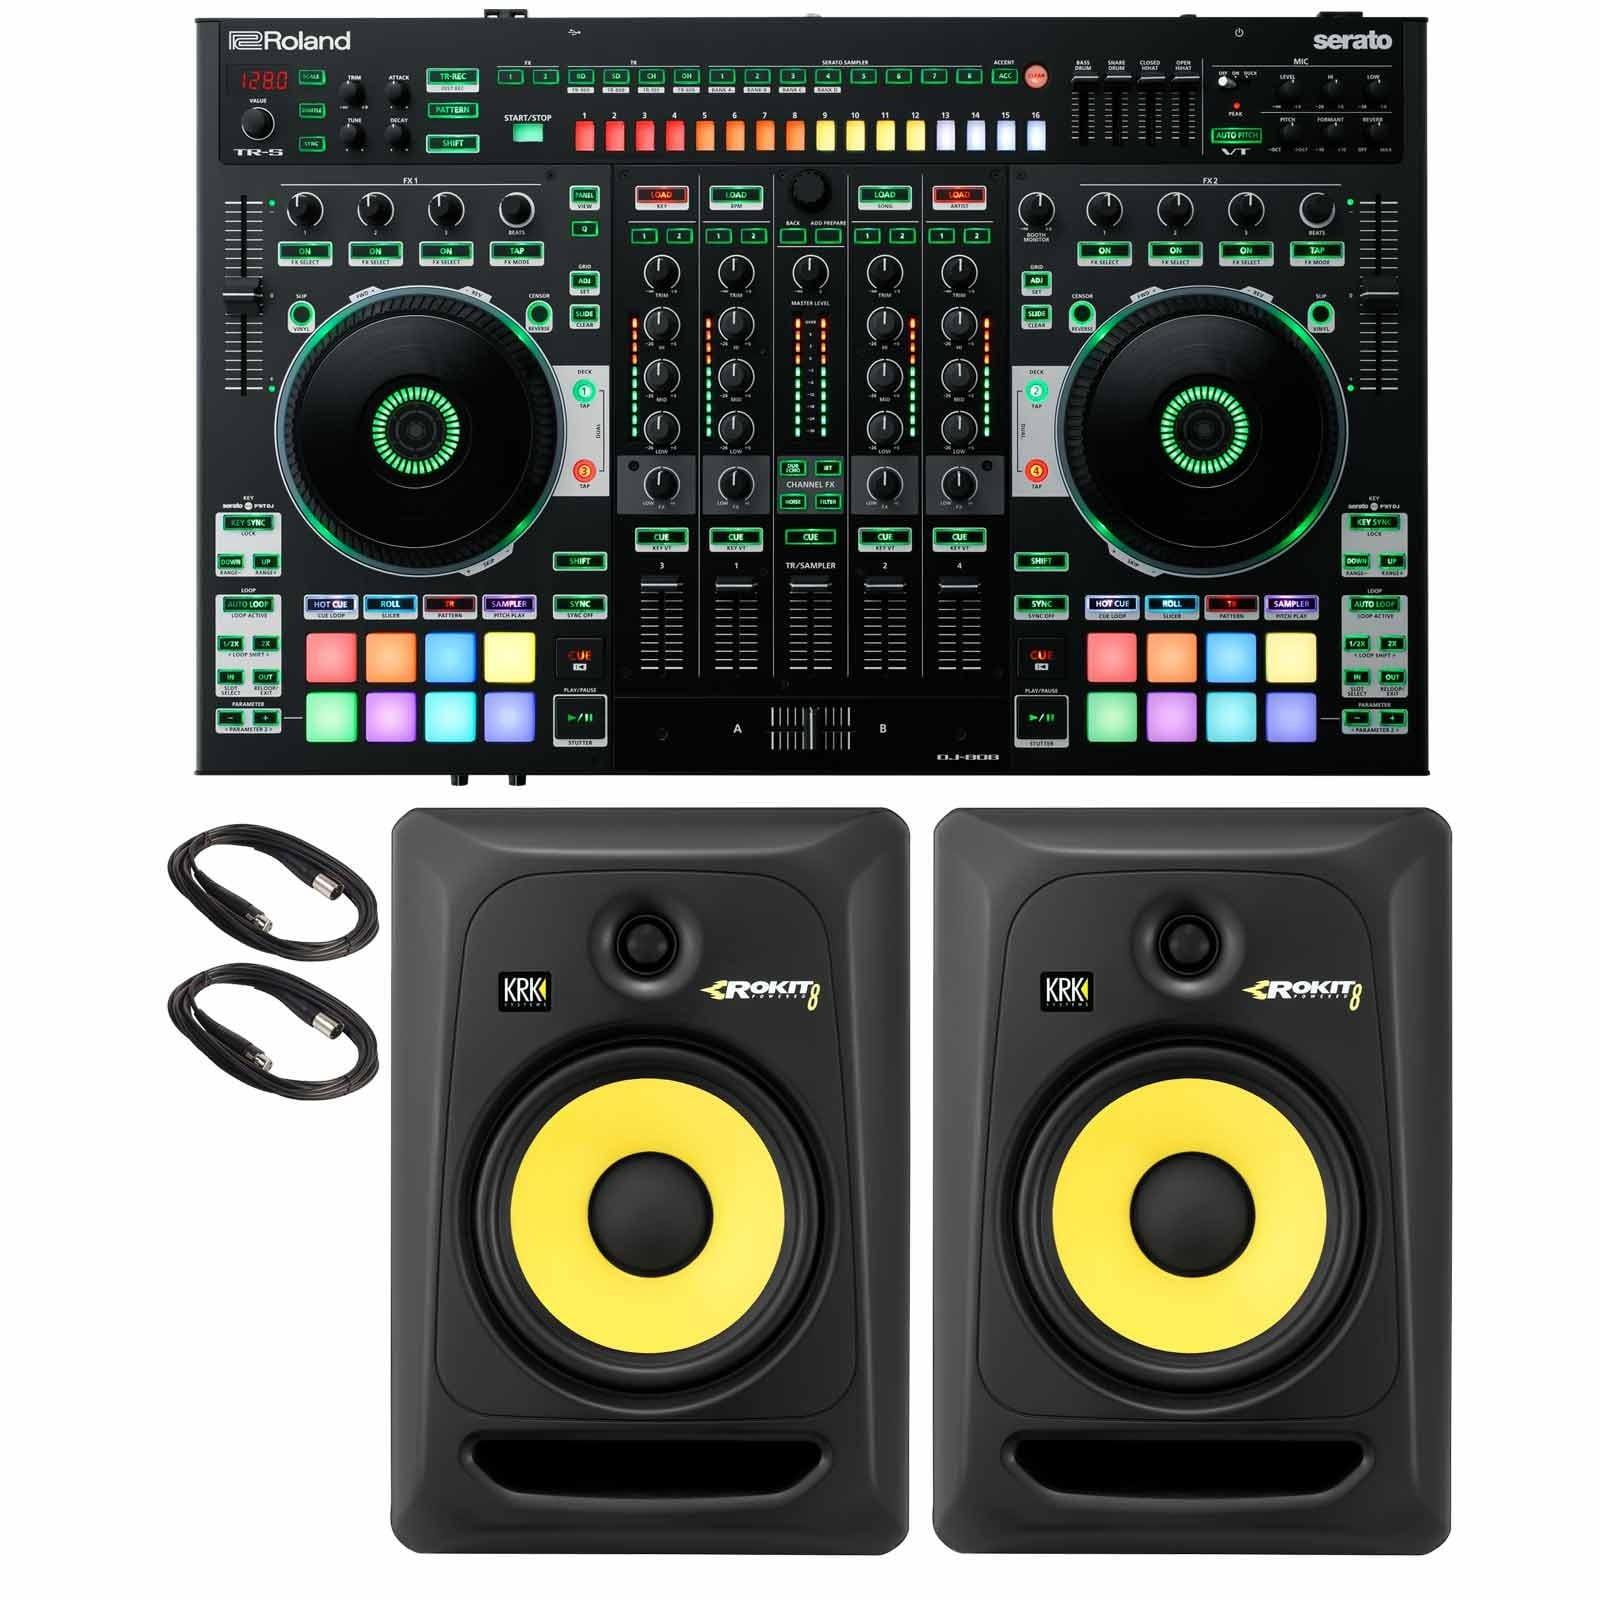 roland dj 808 4 channel mixer dj controller with krk rokit 8 g3 rp8g3 8 powered studio. Black Bedroom Furniture Sets. Home Design Ideas